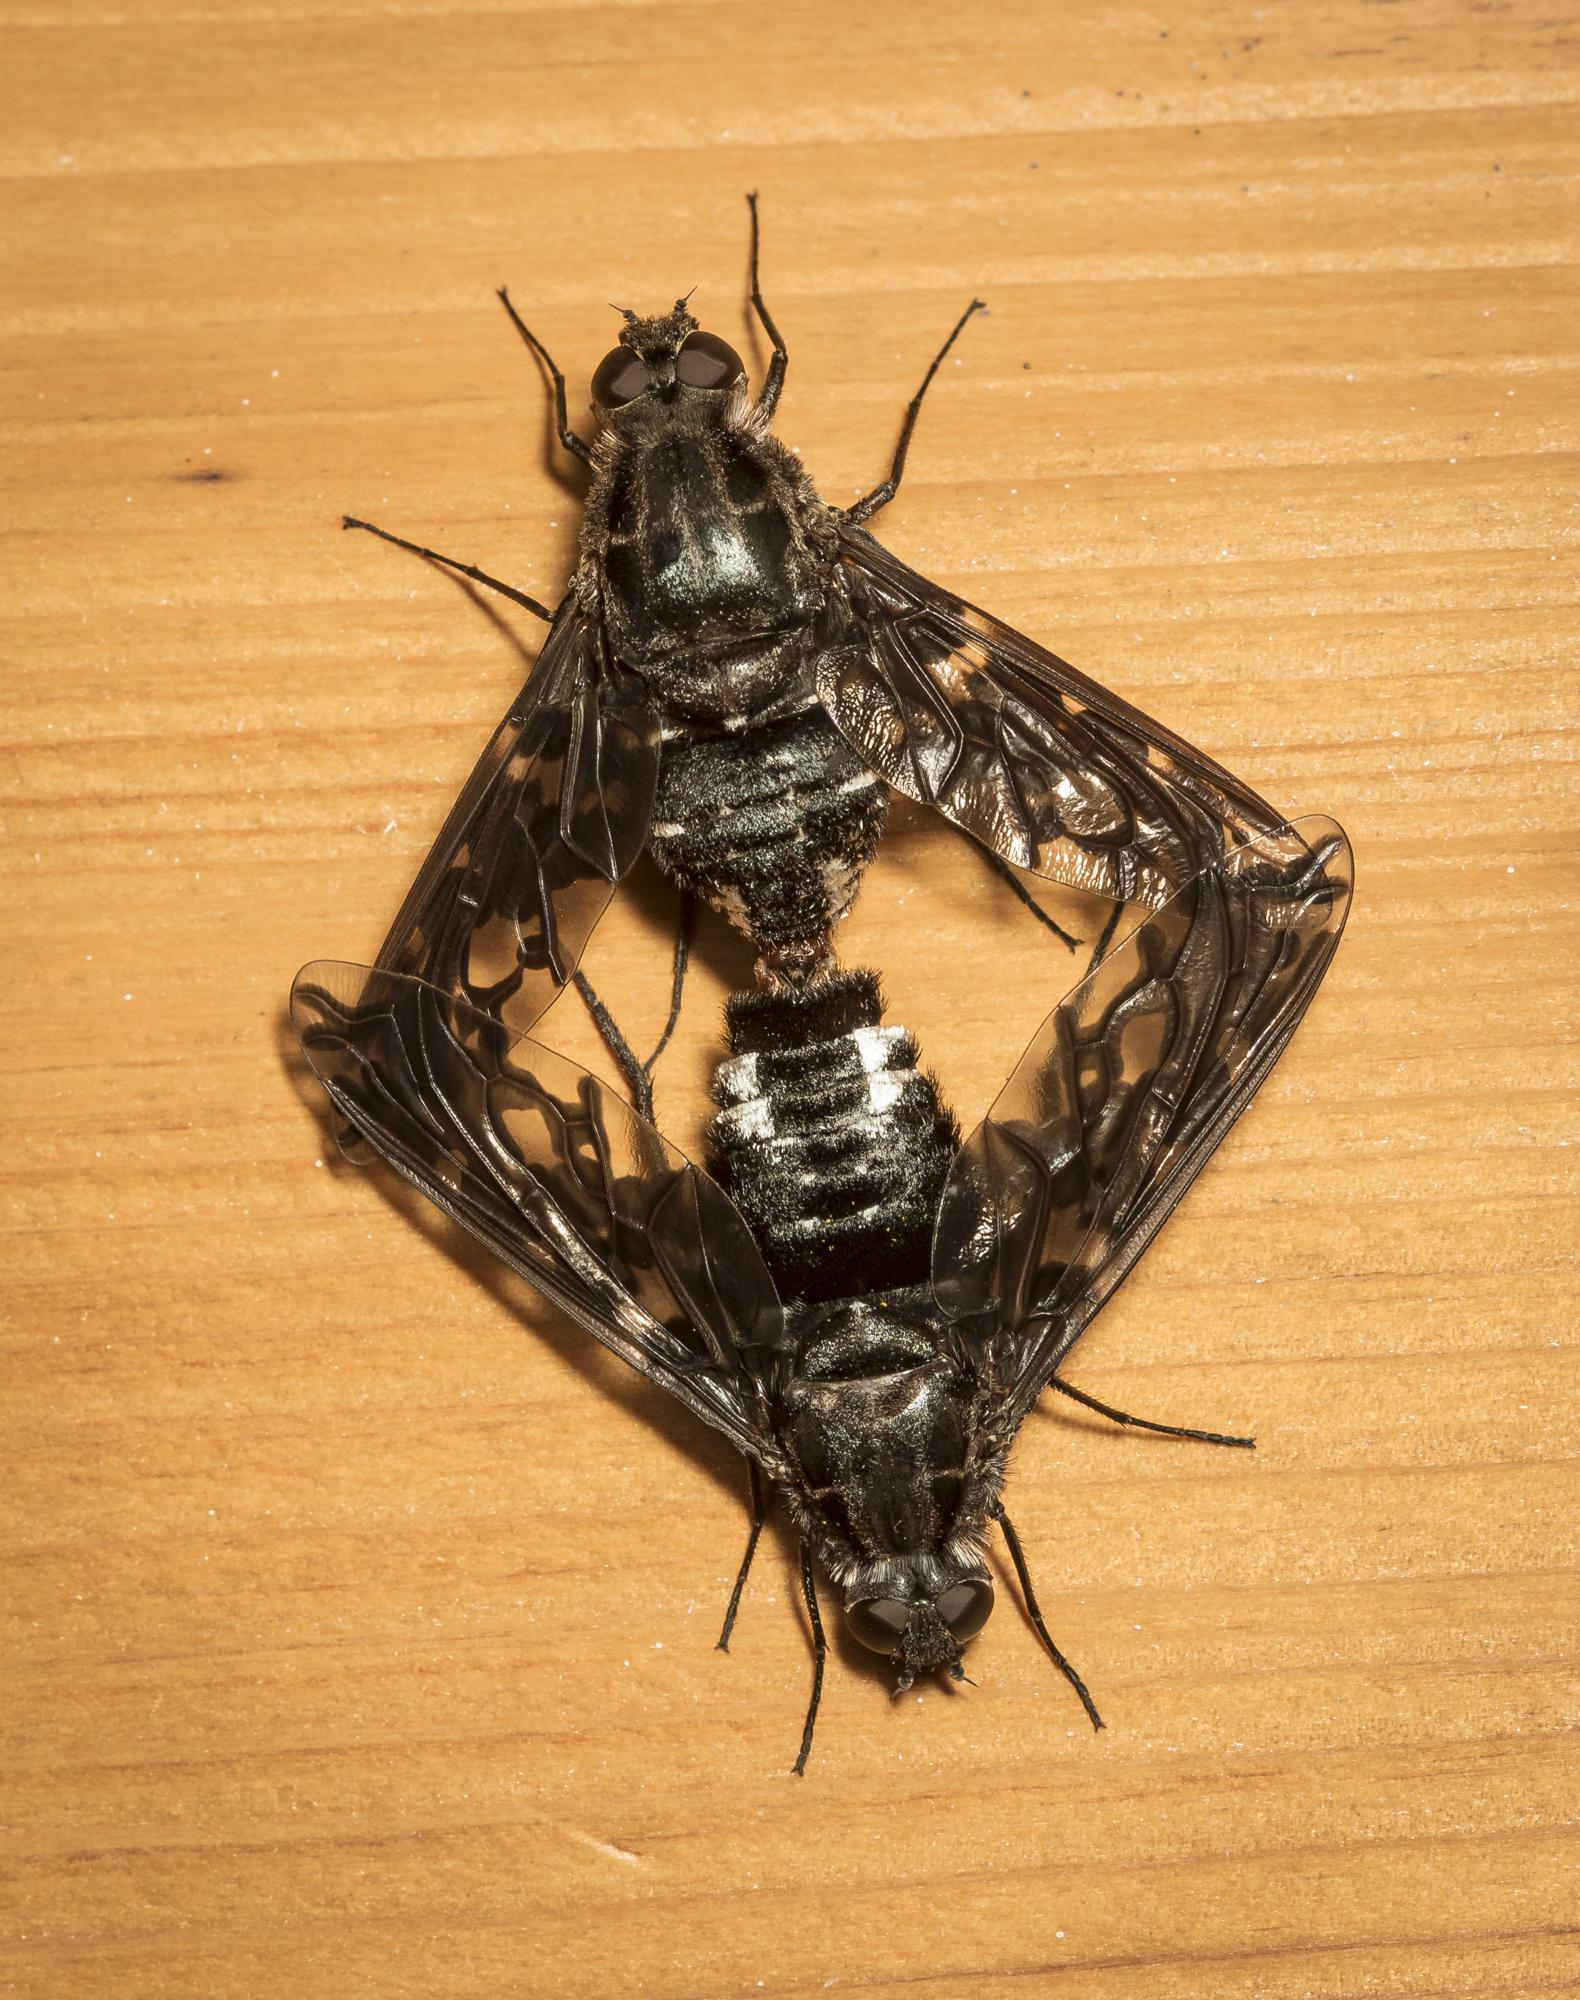 Mating Tiger Bee Flies